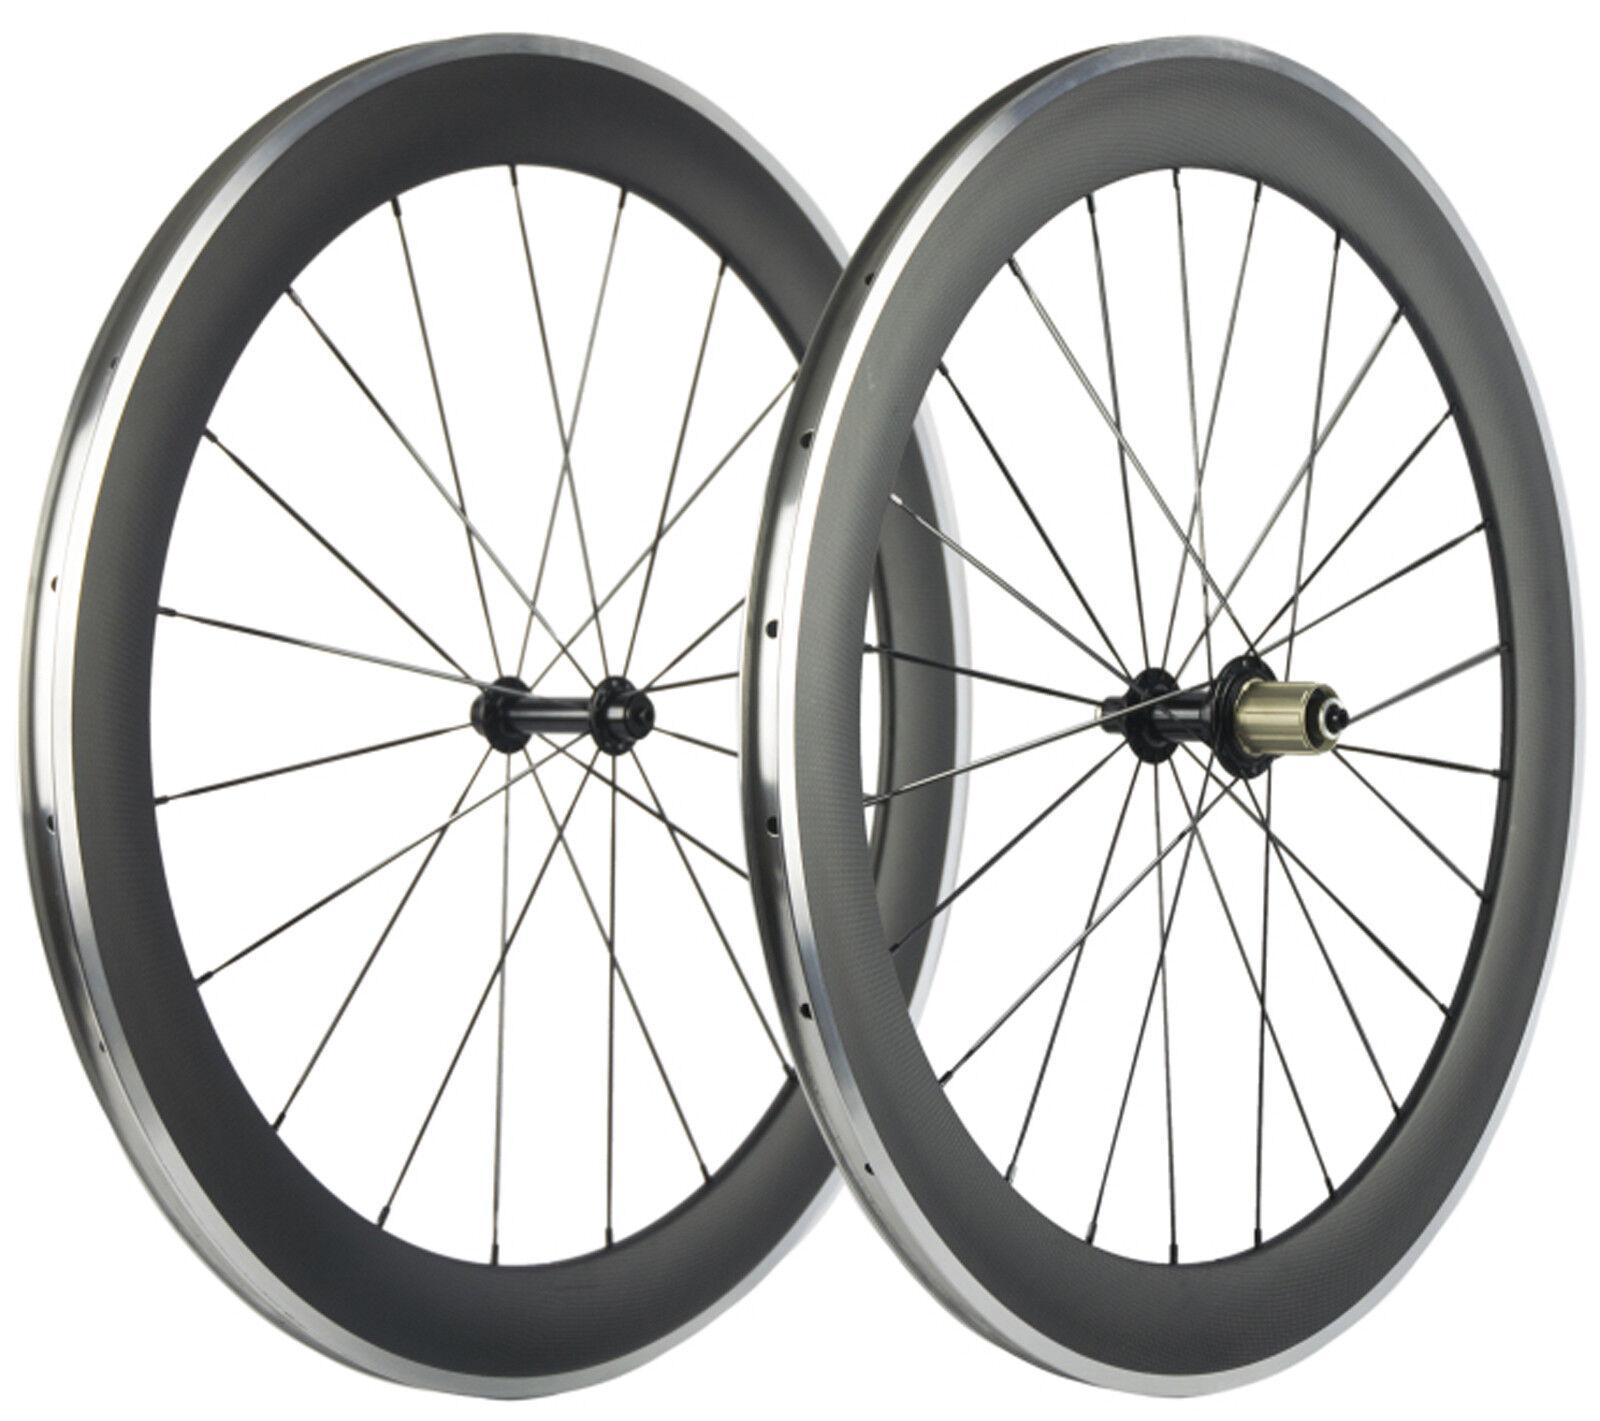 60mm Road Bike Wheelset Full Carbon 700C Clincher Alumunum Brake Bicycle Wheels